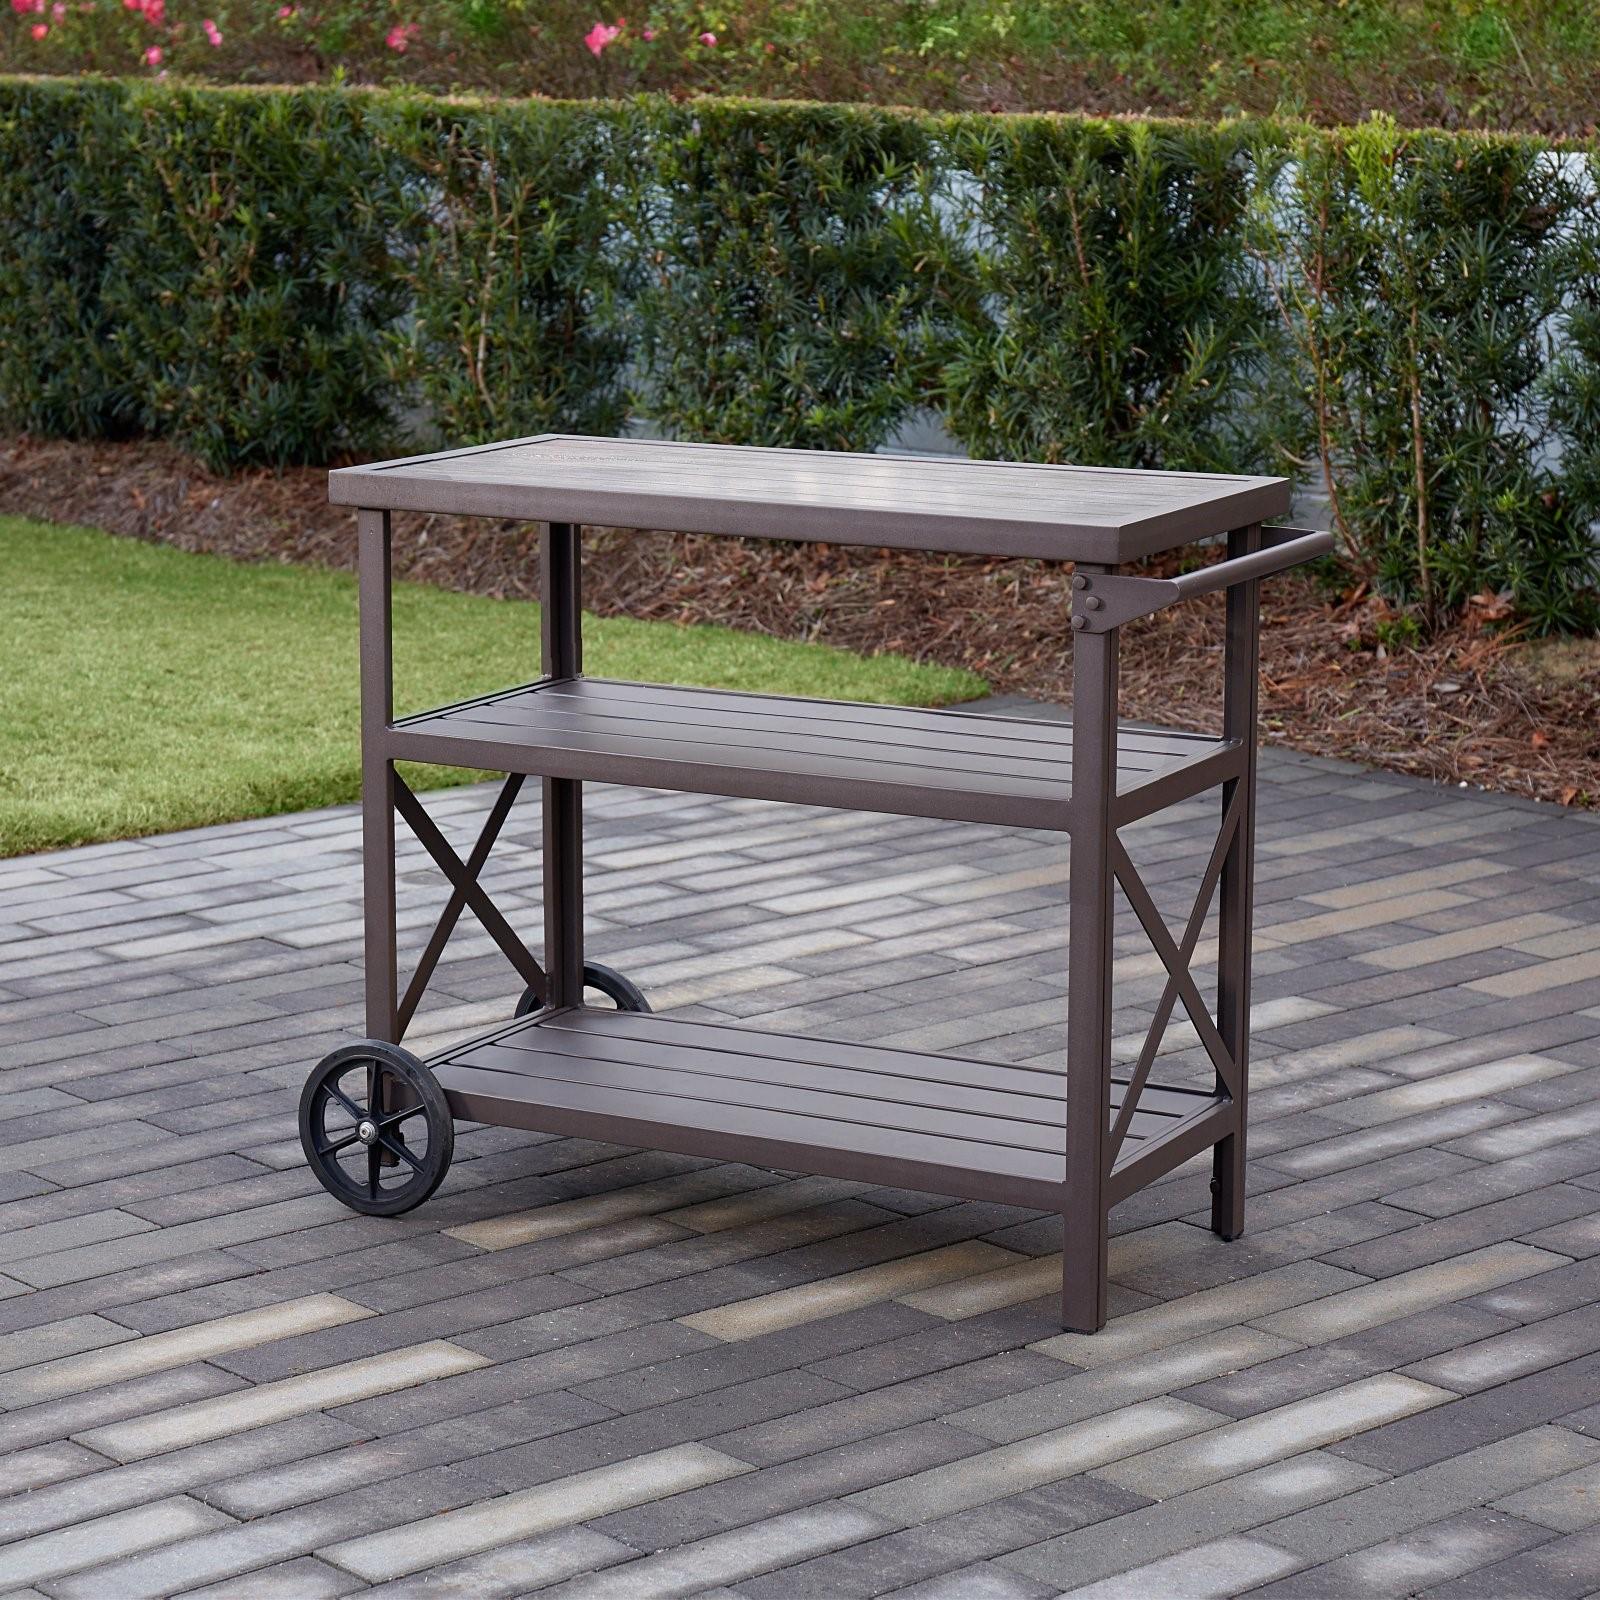 Cosco Outdoor Living Farmstead Aluminum 3 Shelf Serving Cart